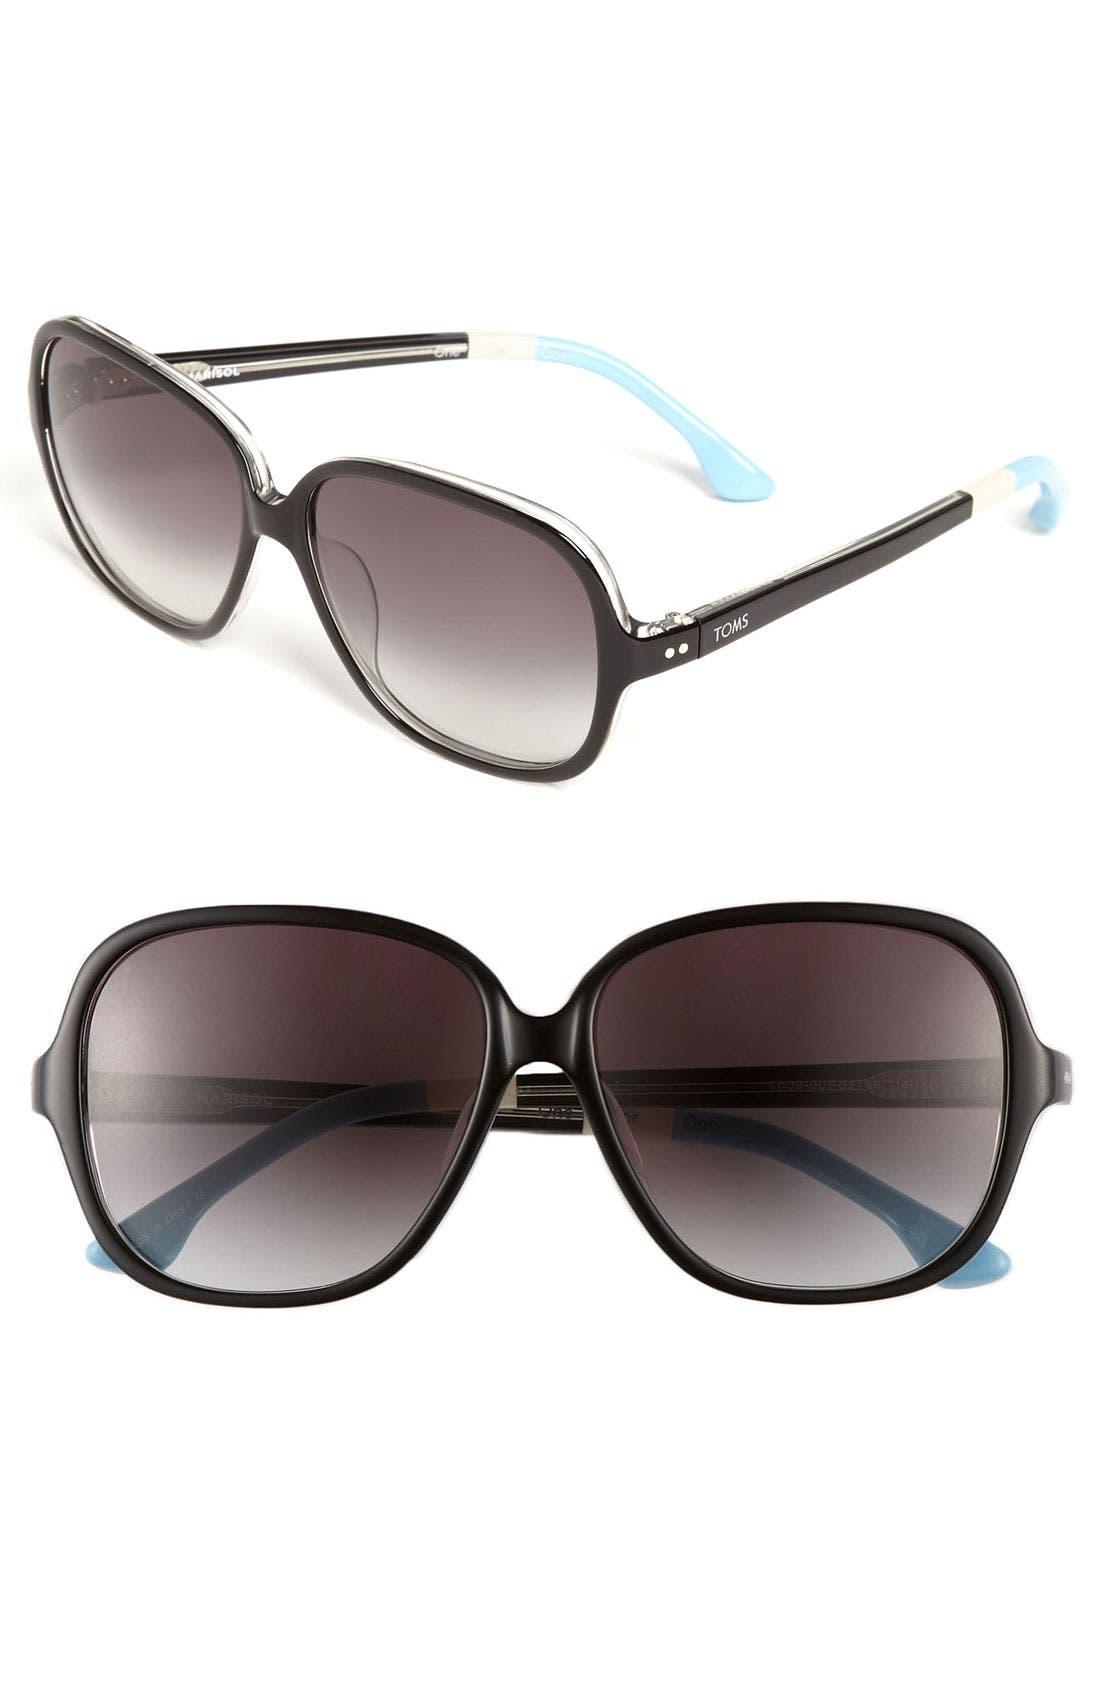 Main Image - TOMS 'Marisol' Sunglasses